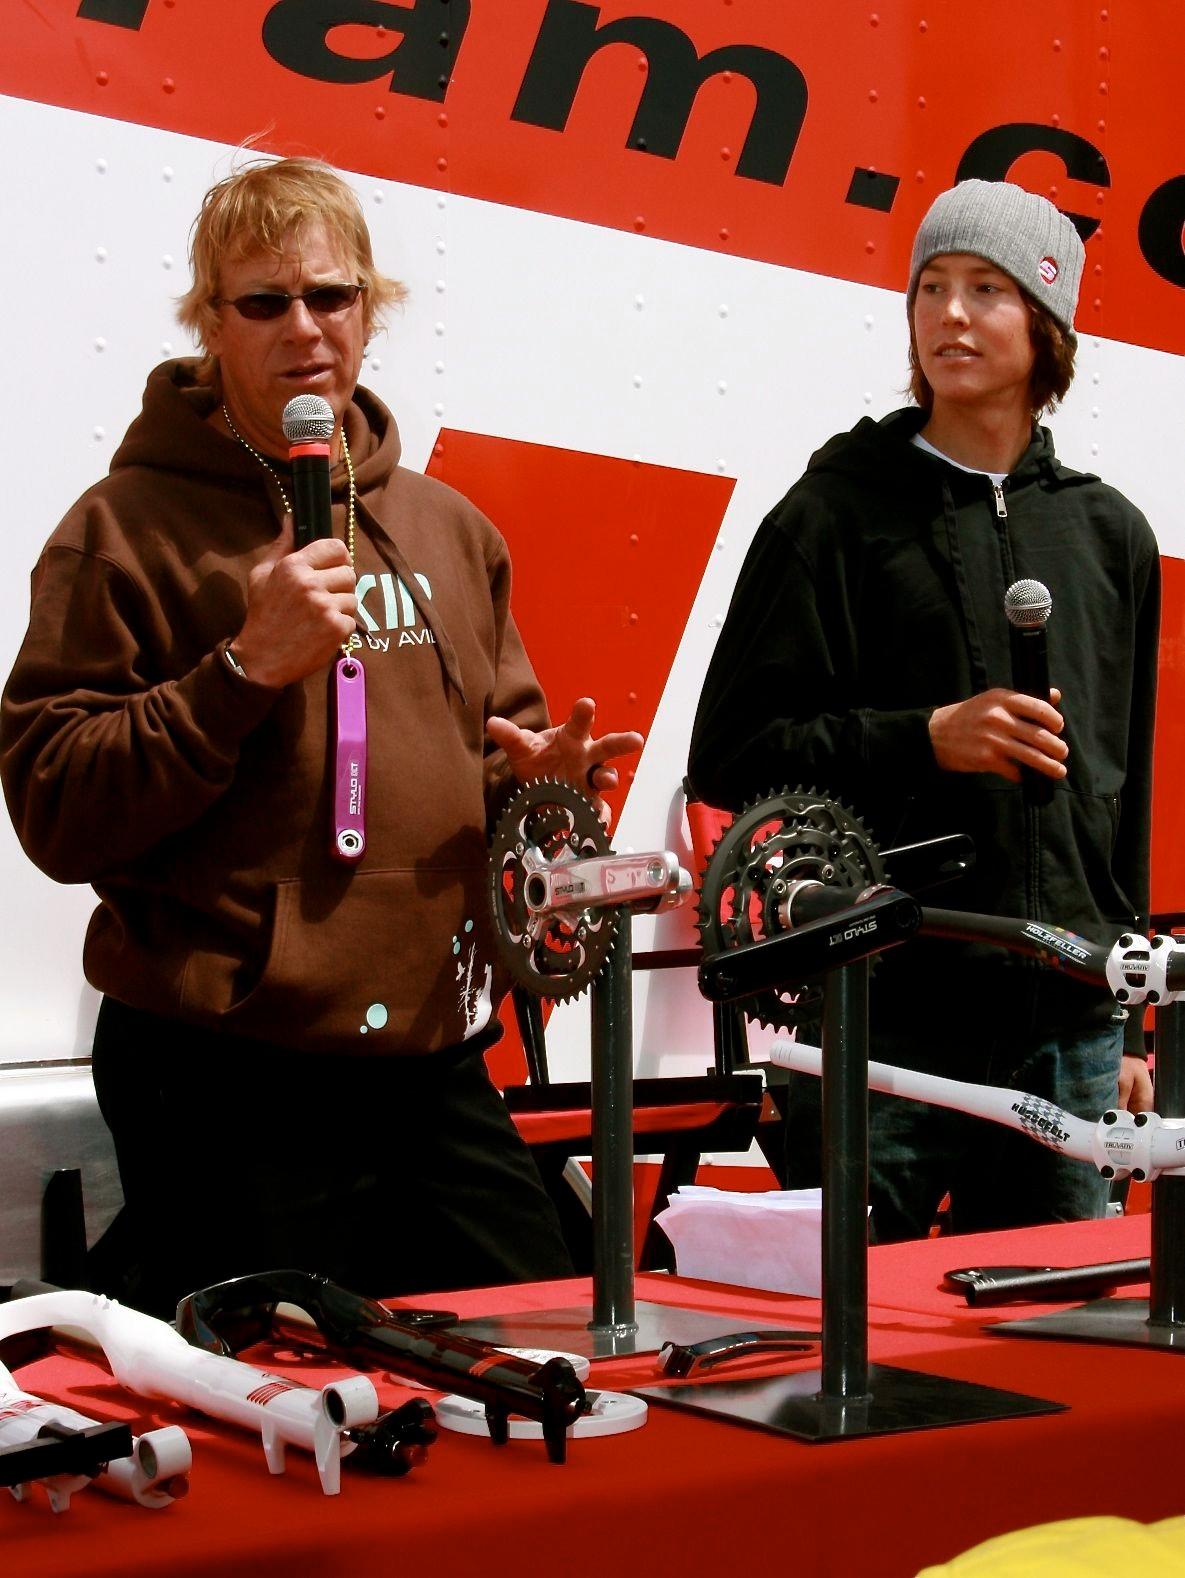 SRAM talking head Greg Herbold and cross country racer Sam Schultz.